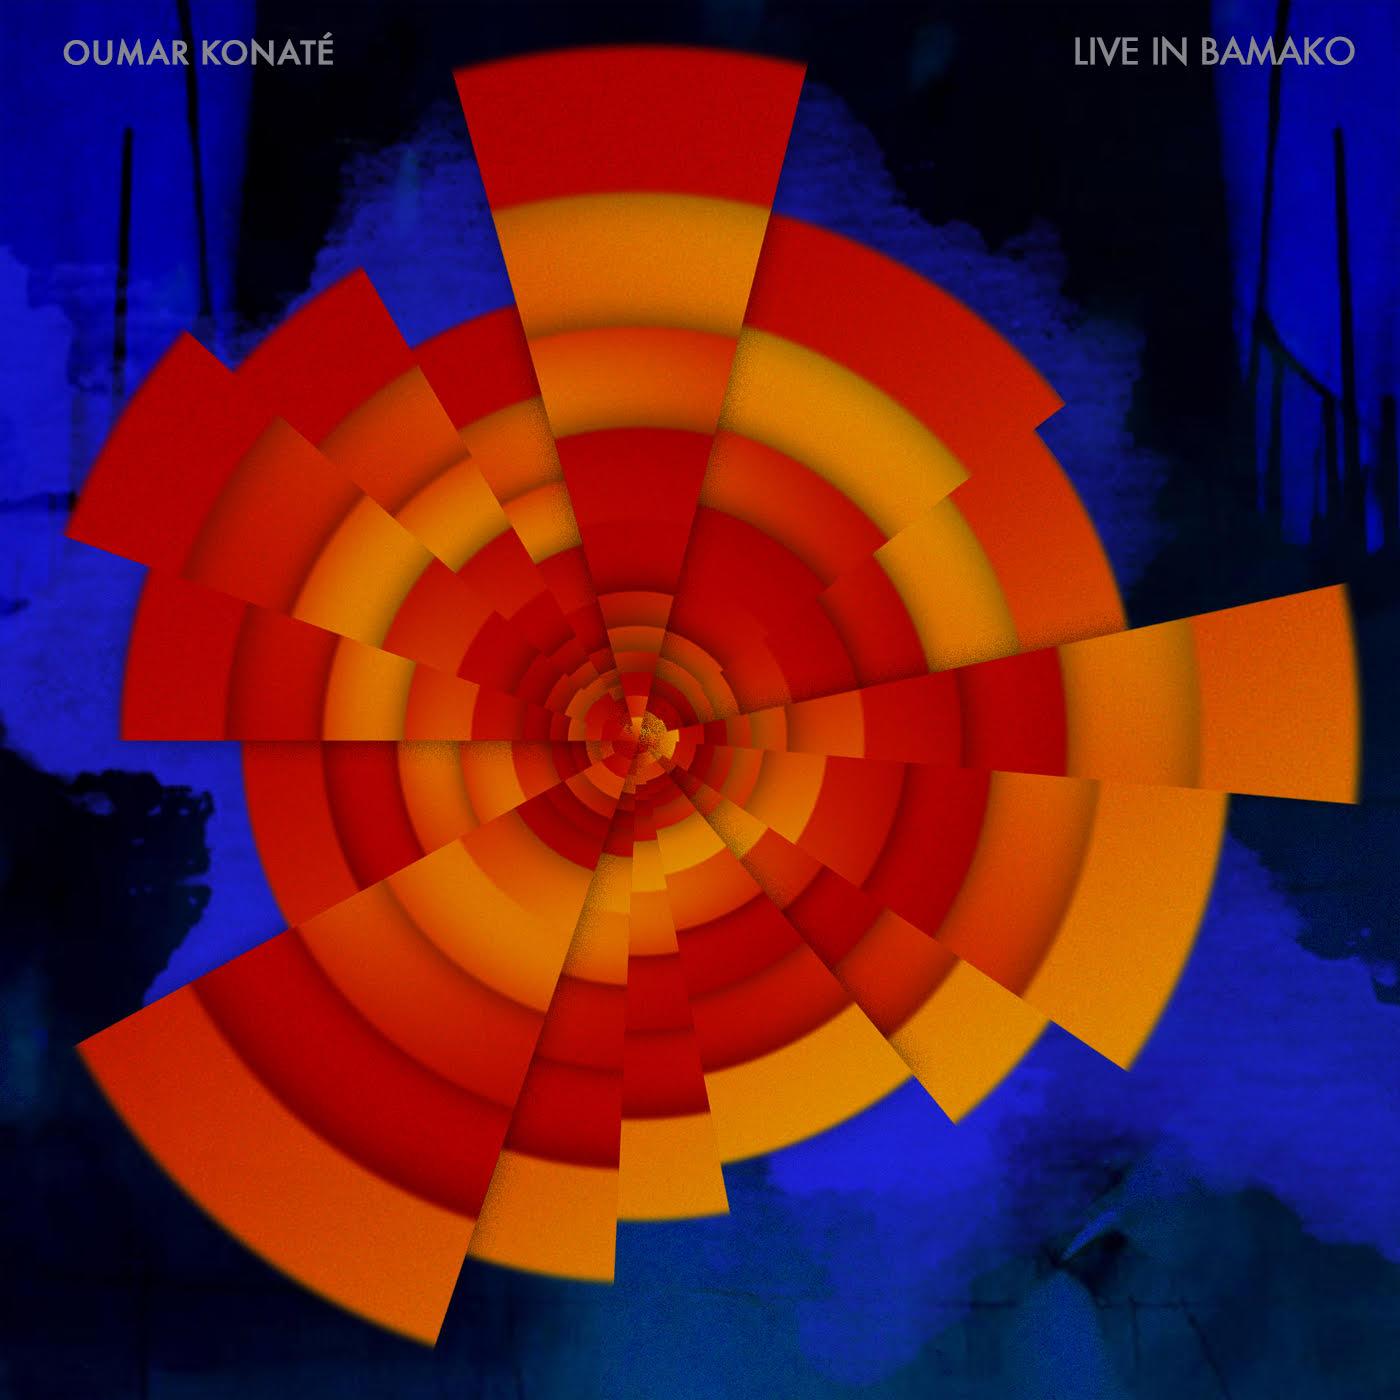 Oumar Konate - Live in Bamako (CLE020)